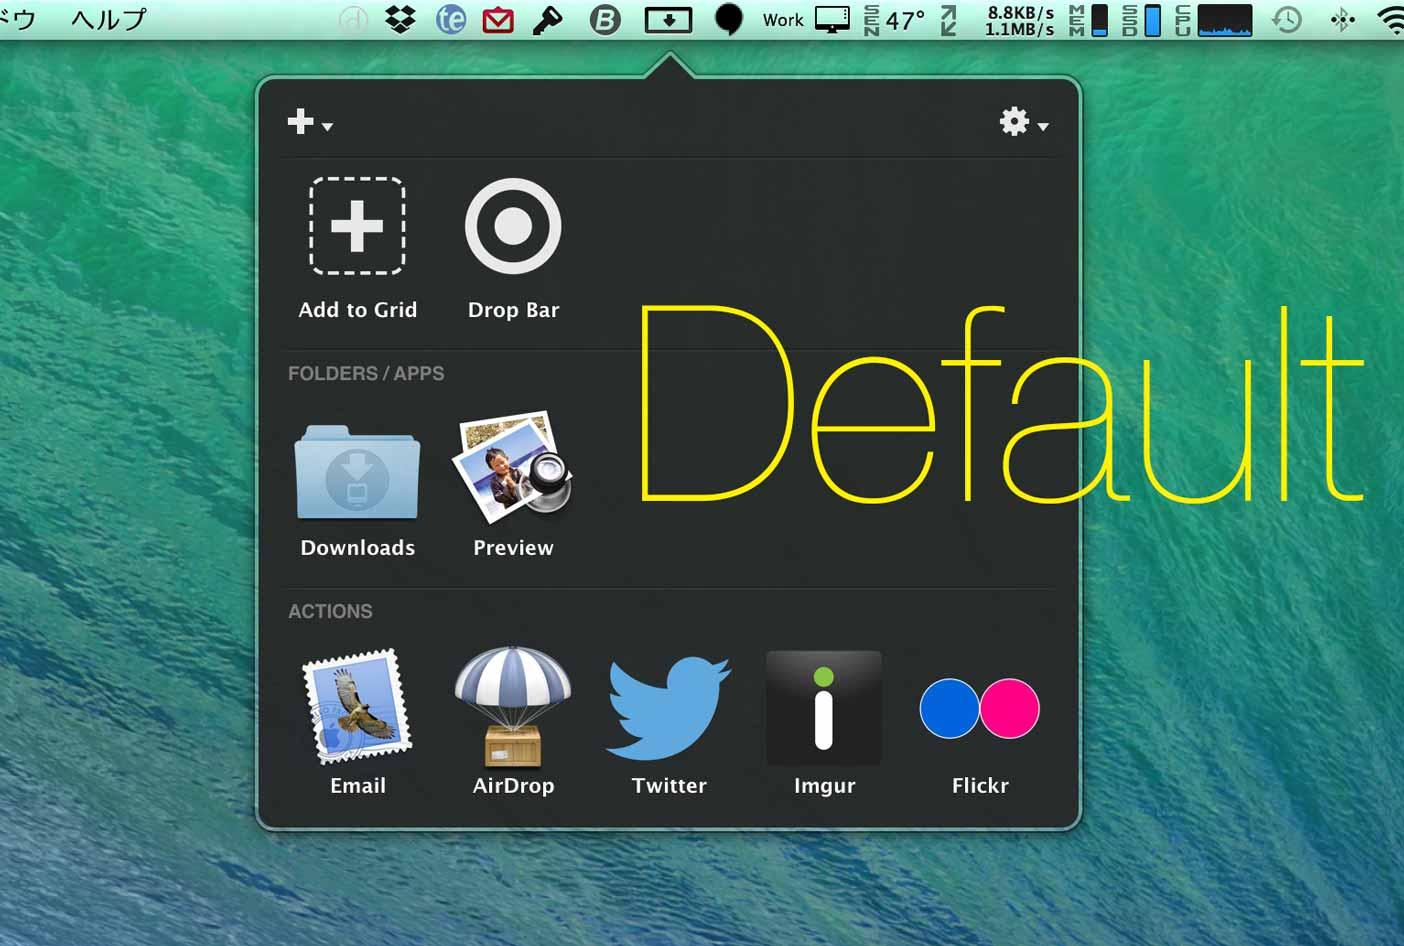 Dropzone default設定